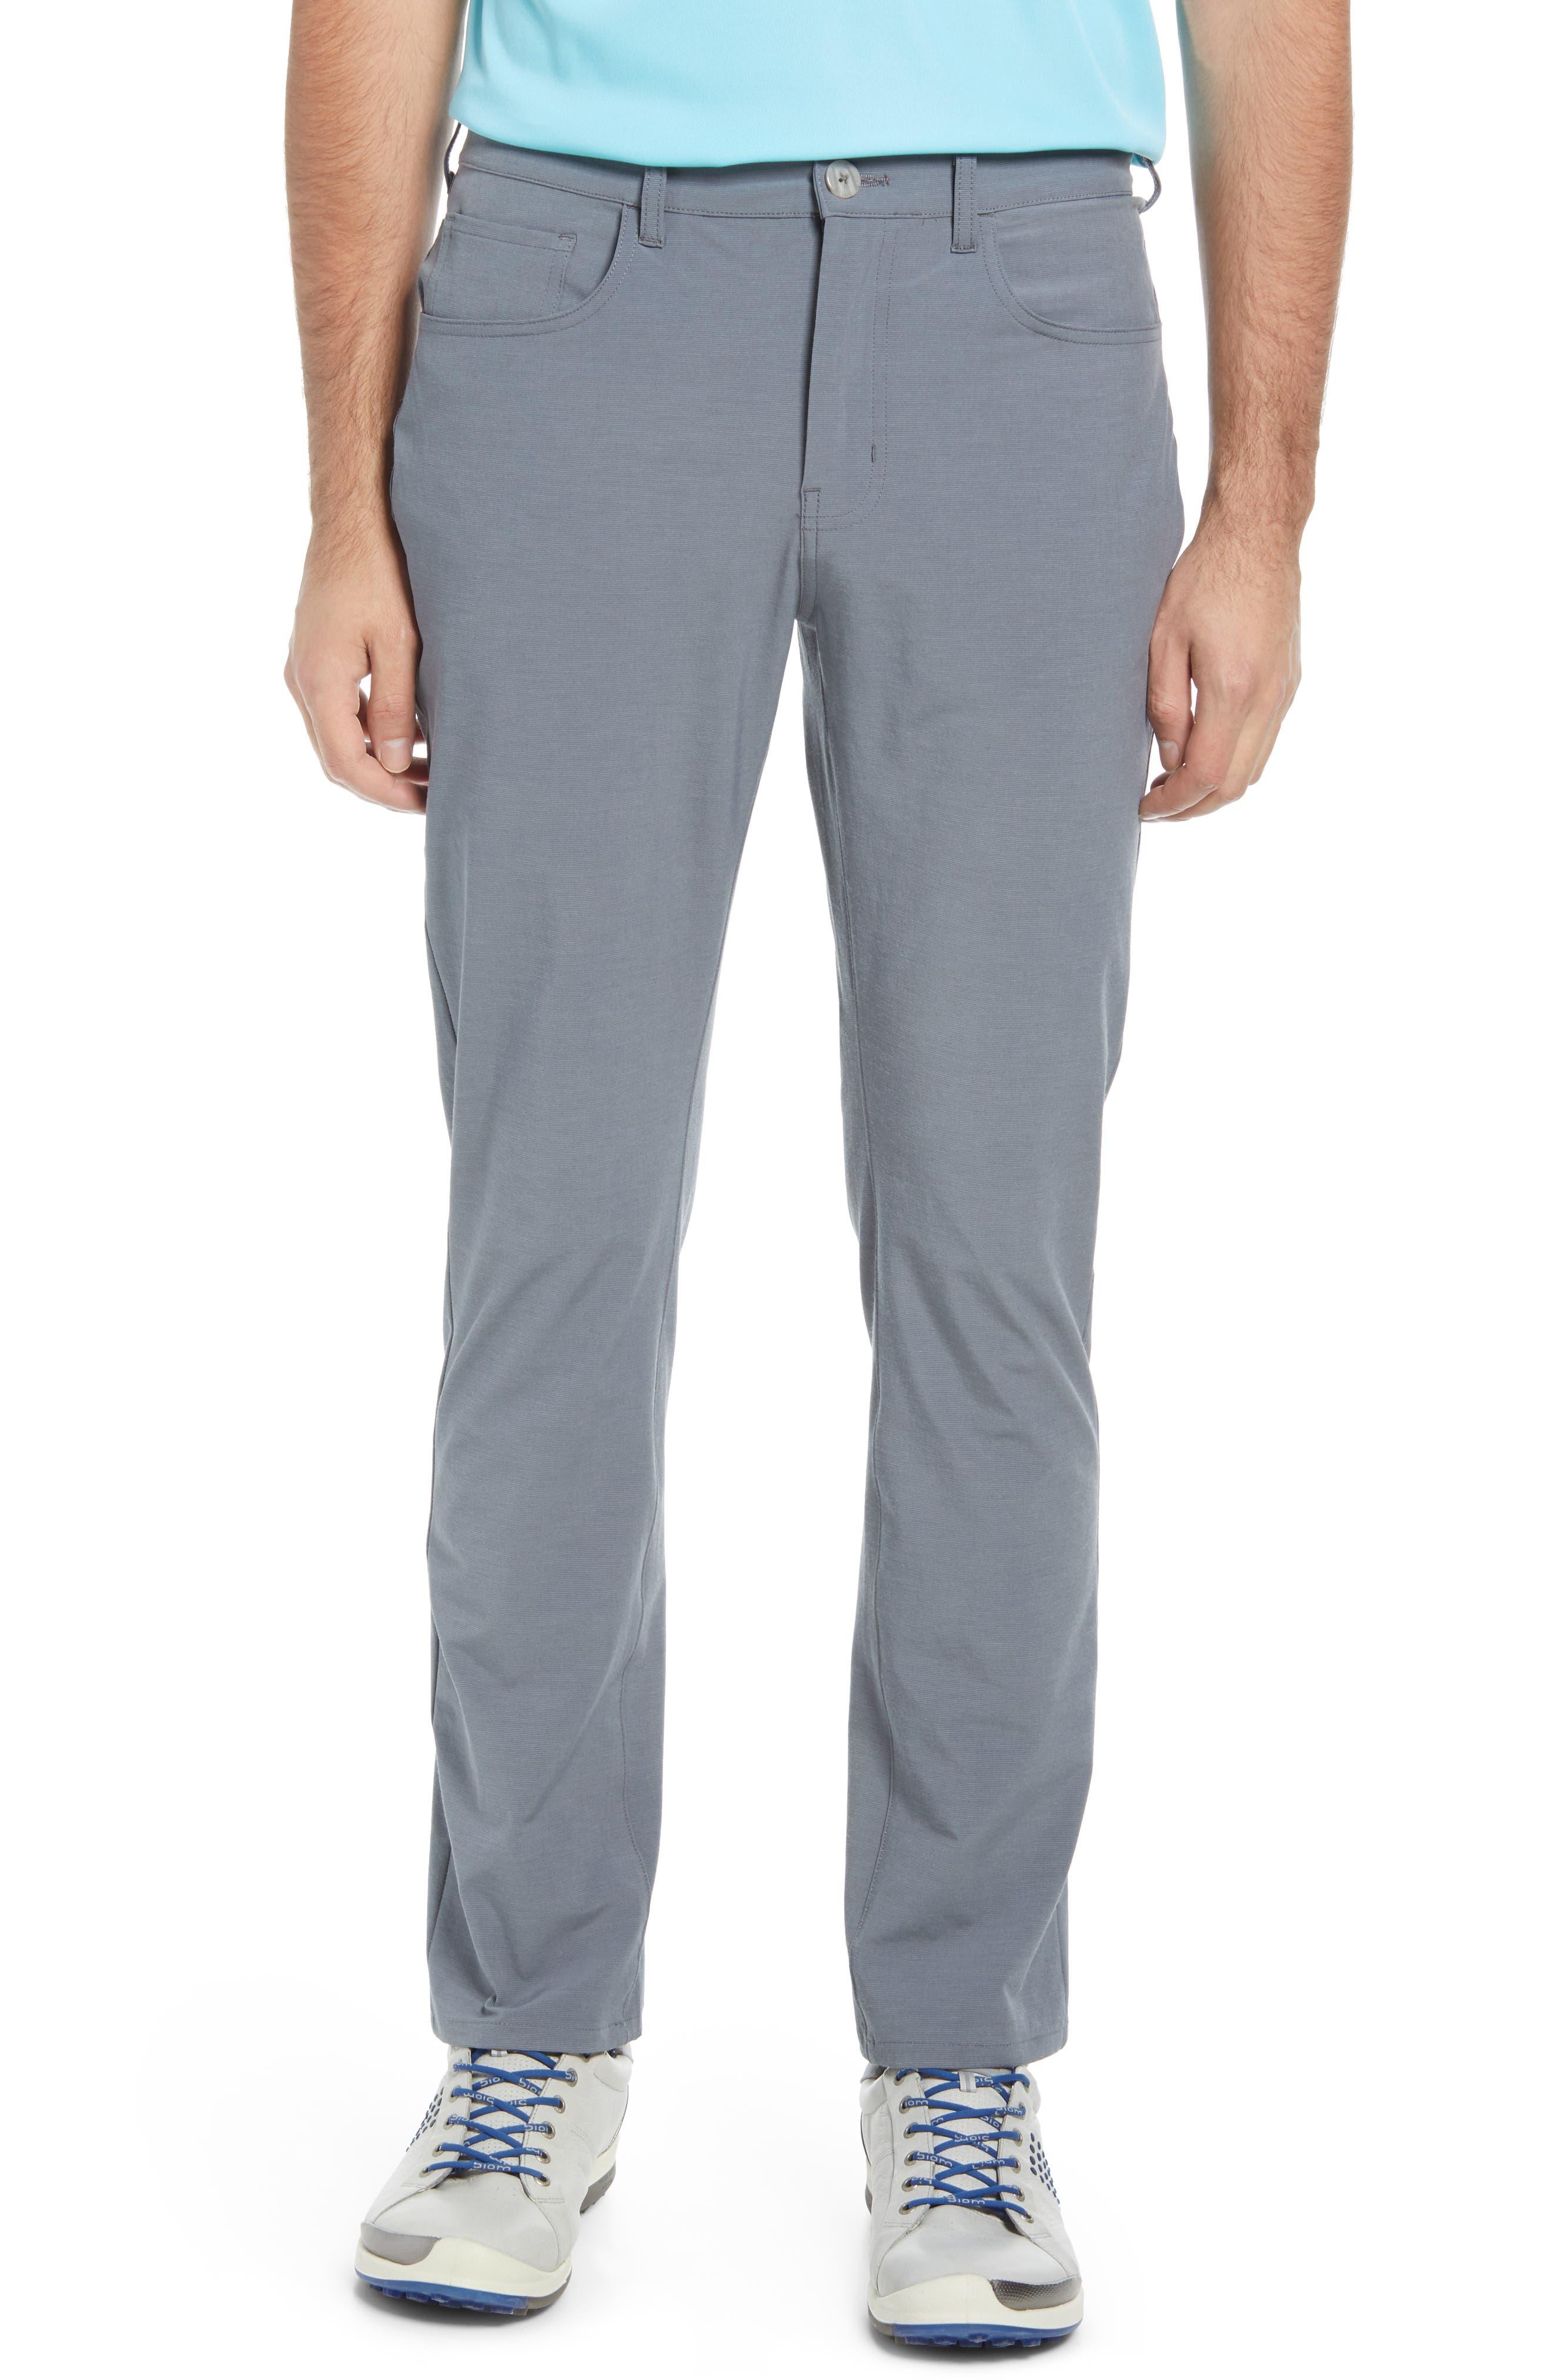 Men's Callaway Golf Stretch Five Pocket Golf Pants